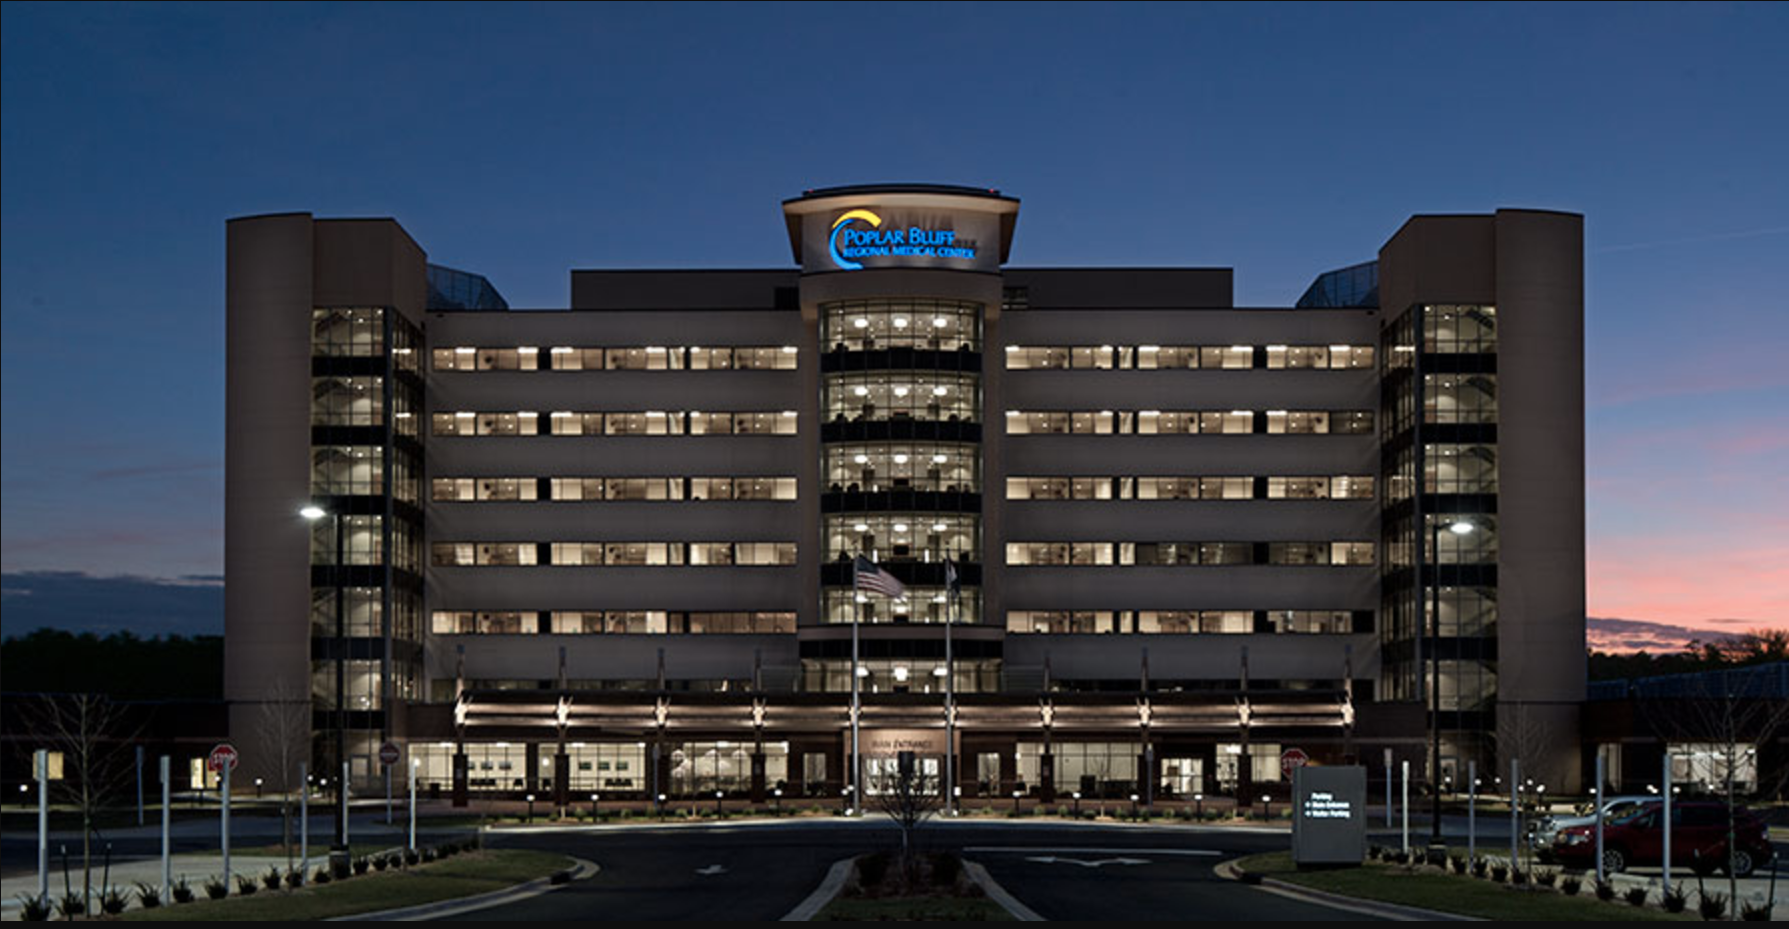 Doctors Hospital Poplar Bluff, MO